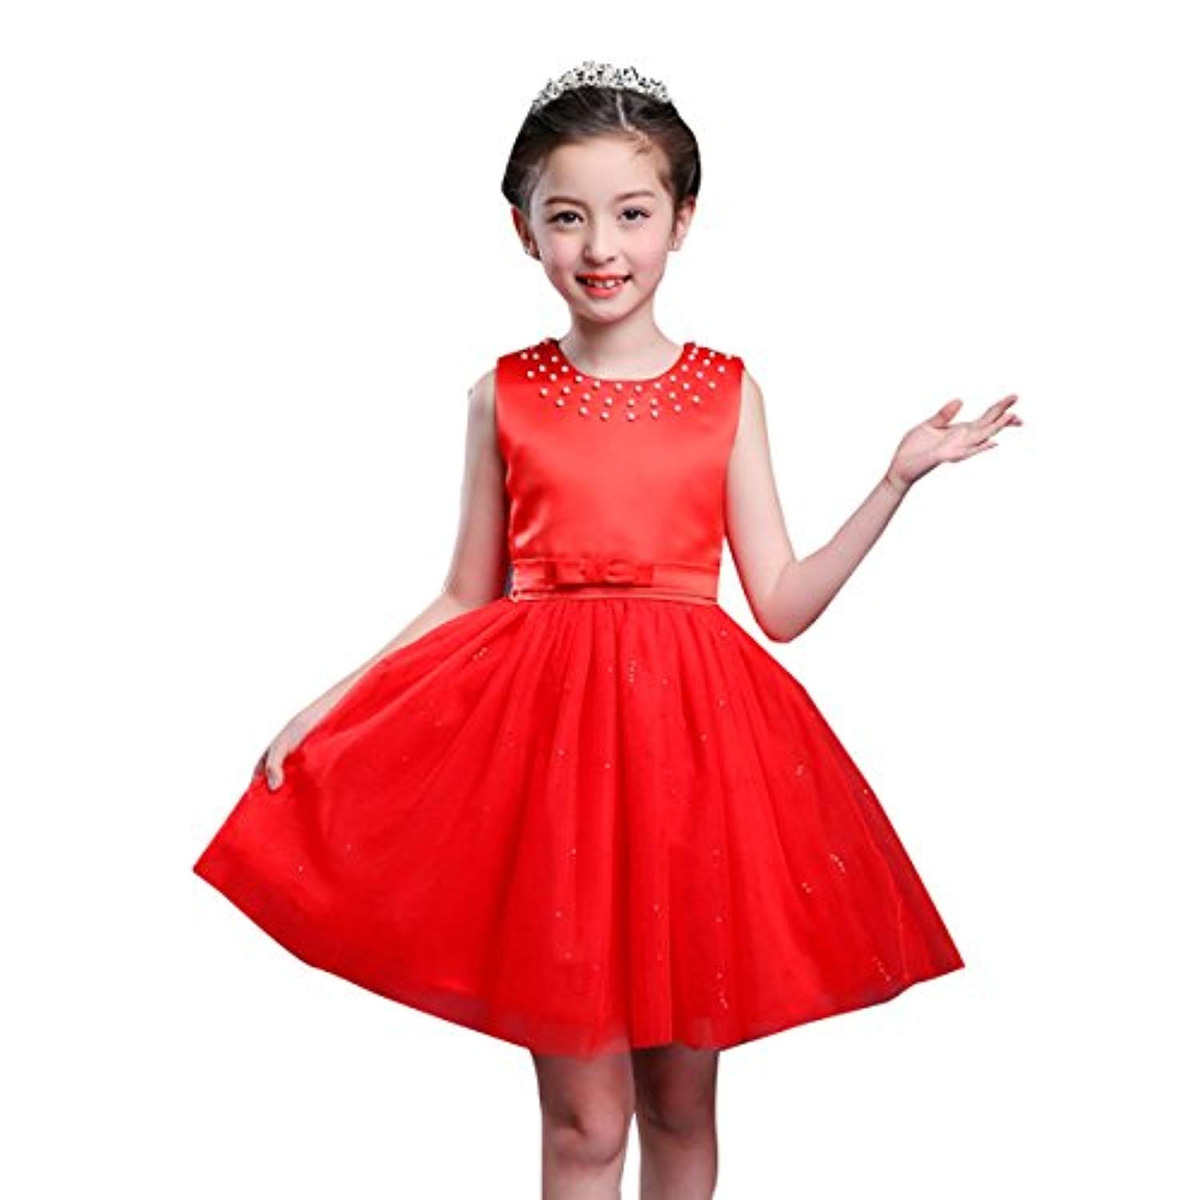 6b7c80d08 Vestidos Para Niñas Pequeño Dragón Cerdo - $ 1,537.79 en Mercado Libre